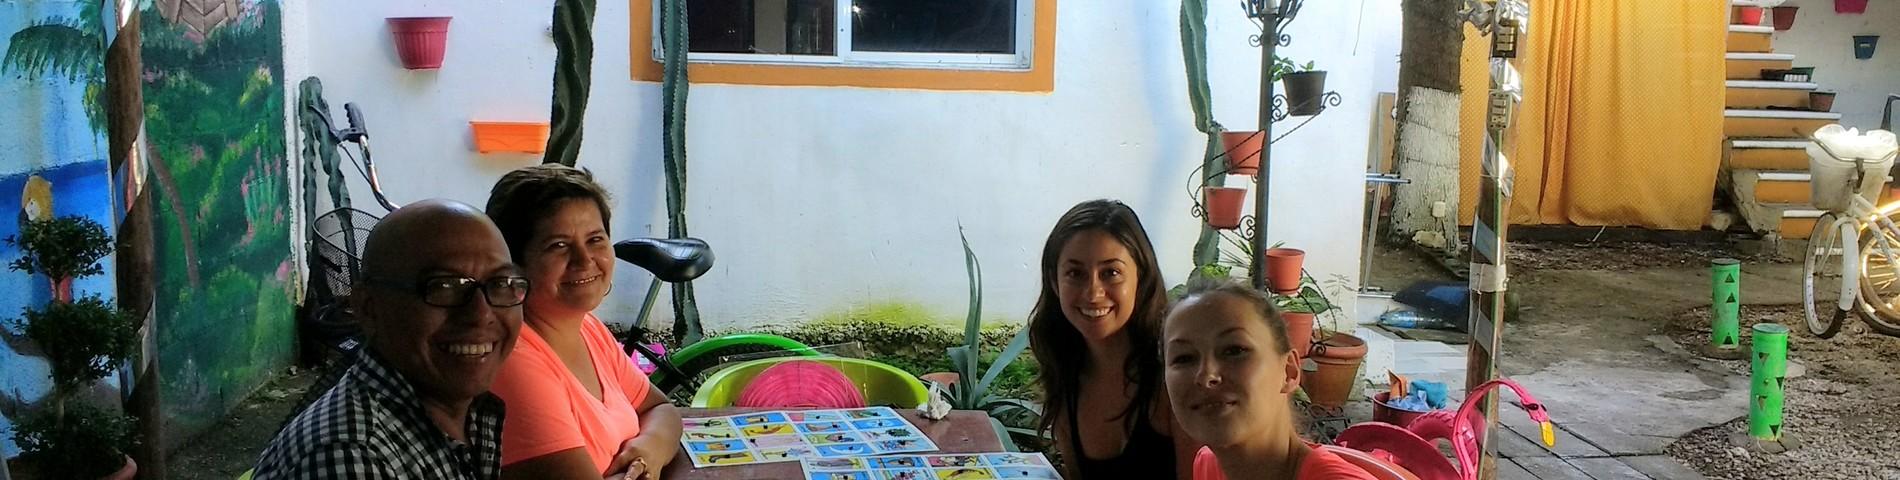 Chichén Itzá Language School photo 1